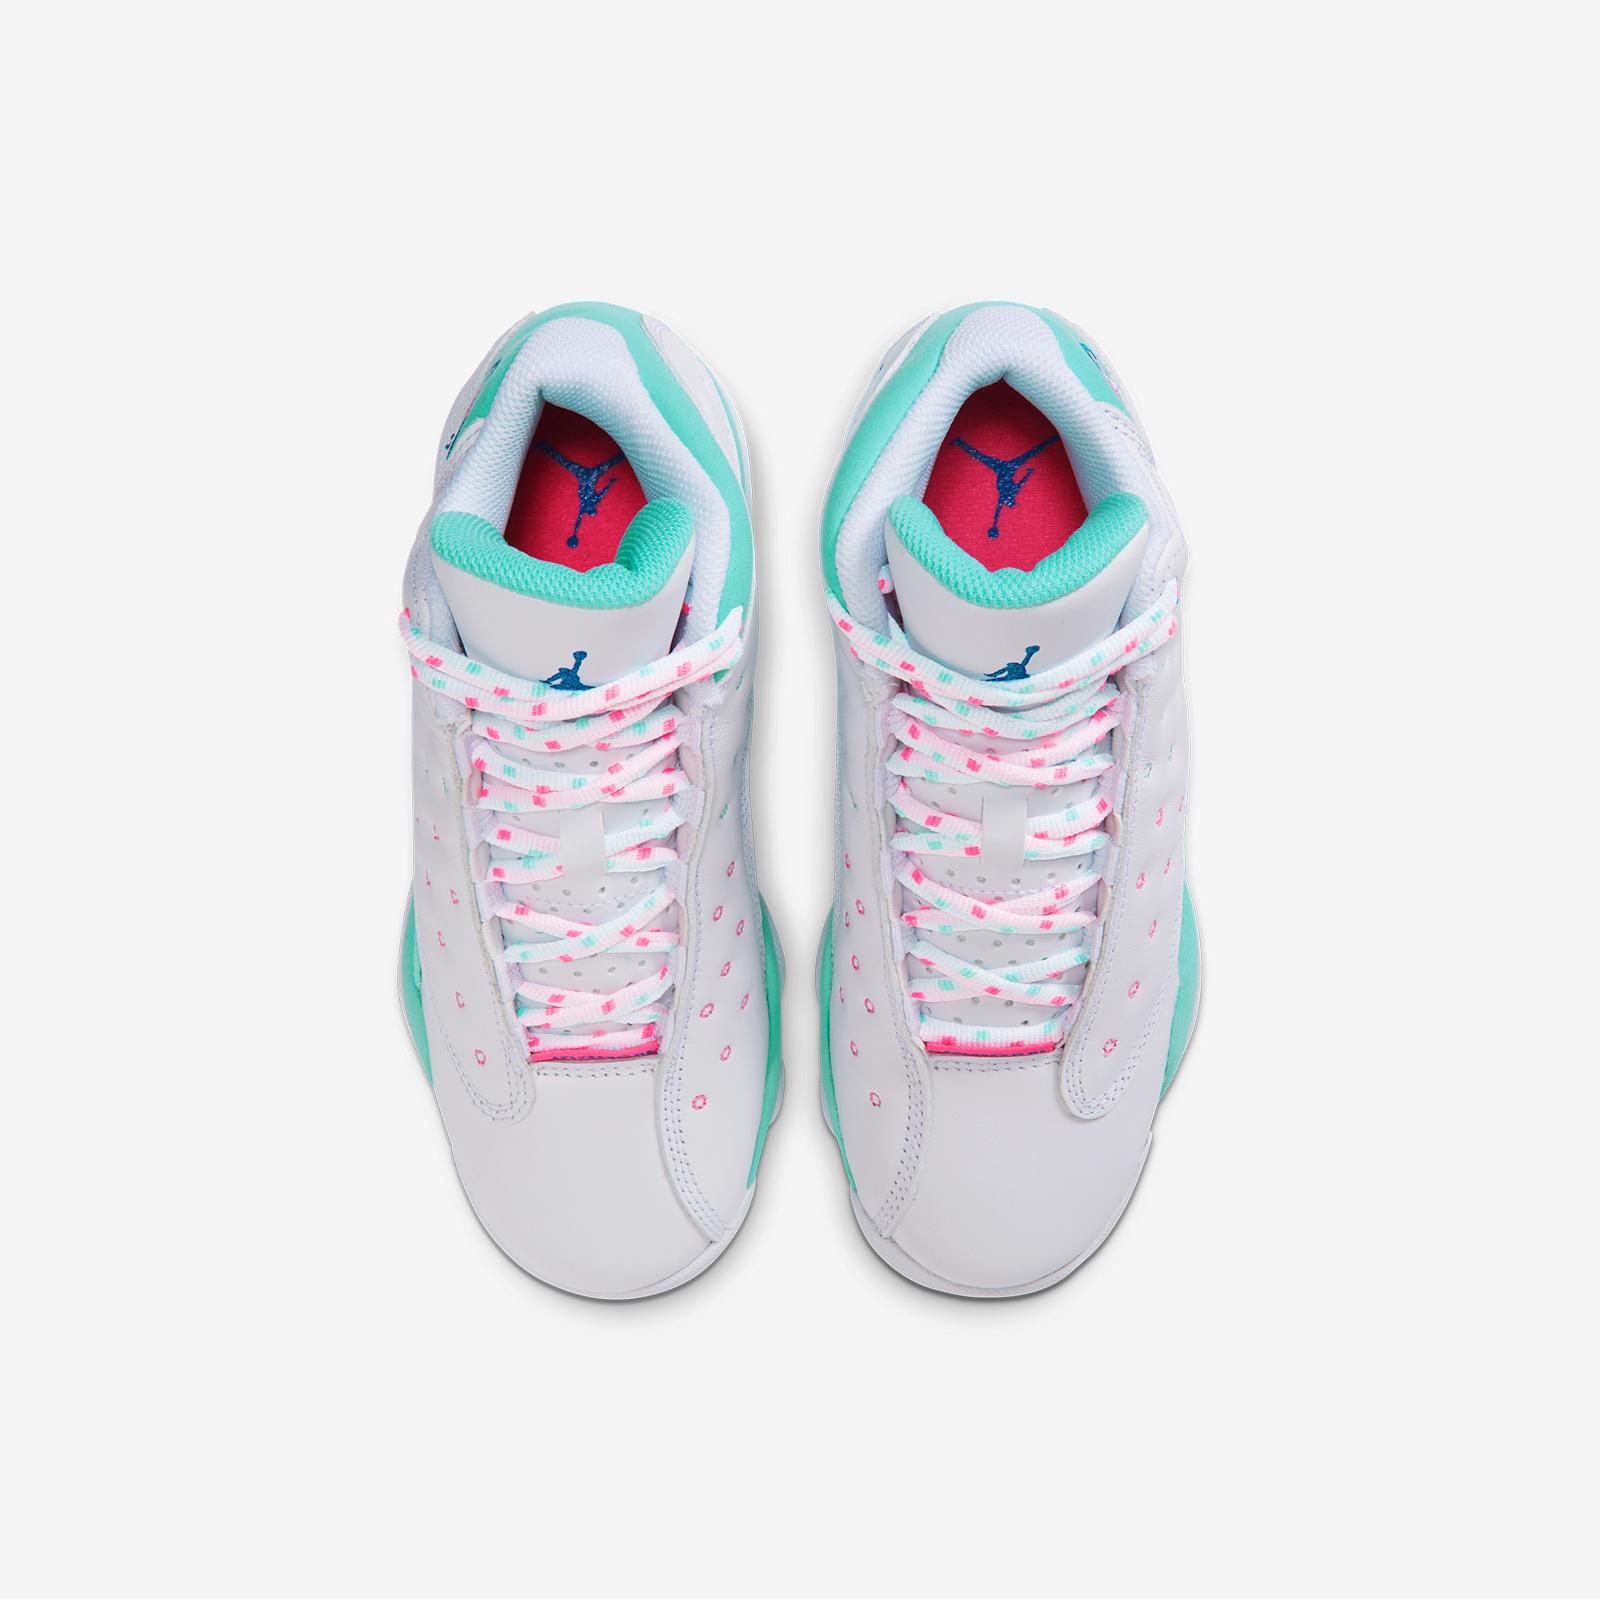 Jordan Brand Air Jordan 13 Retro Gs 439358 100 Sneakersnstuff Sneakers Streetwear Online Since 1999